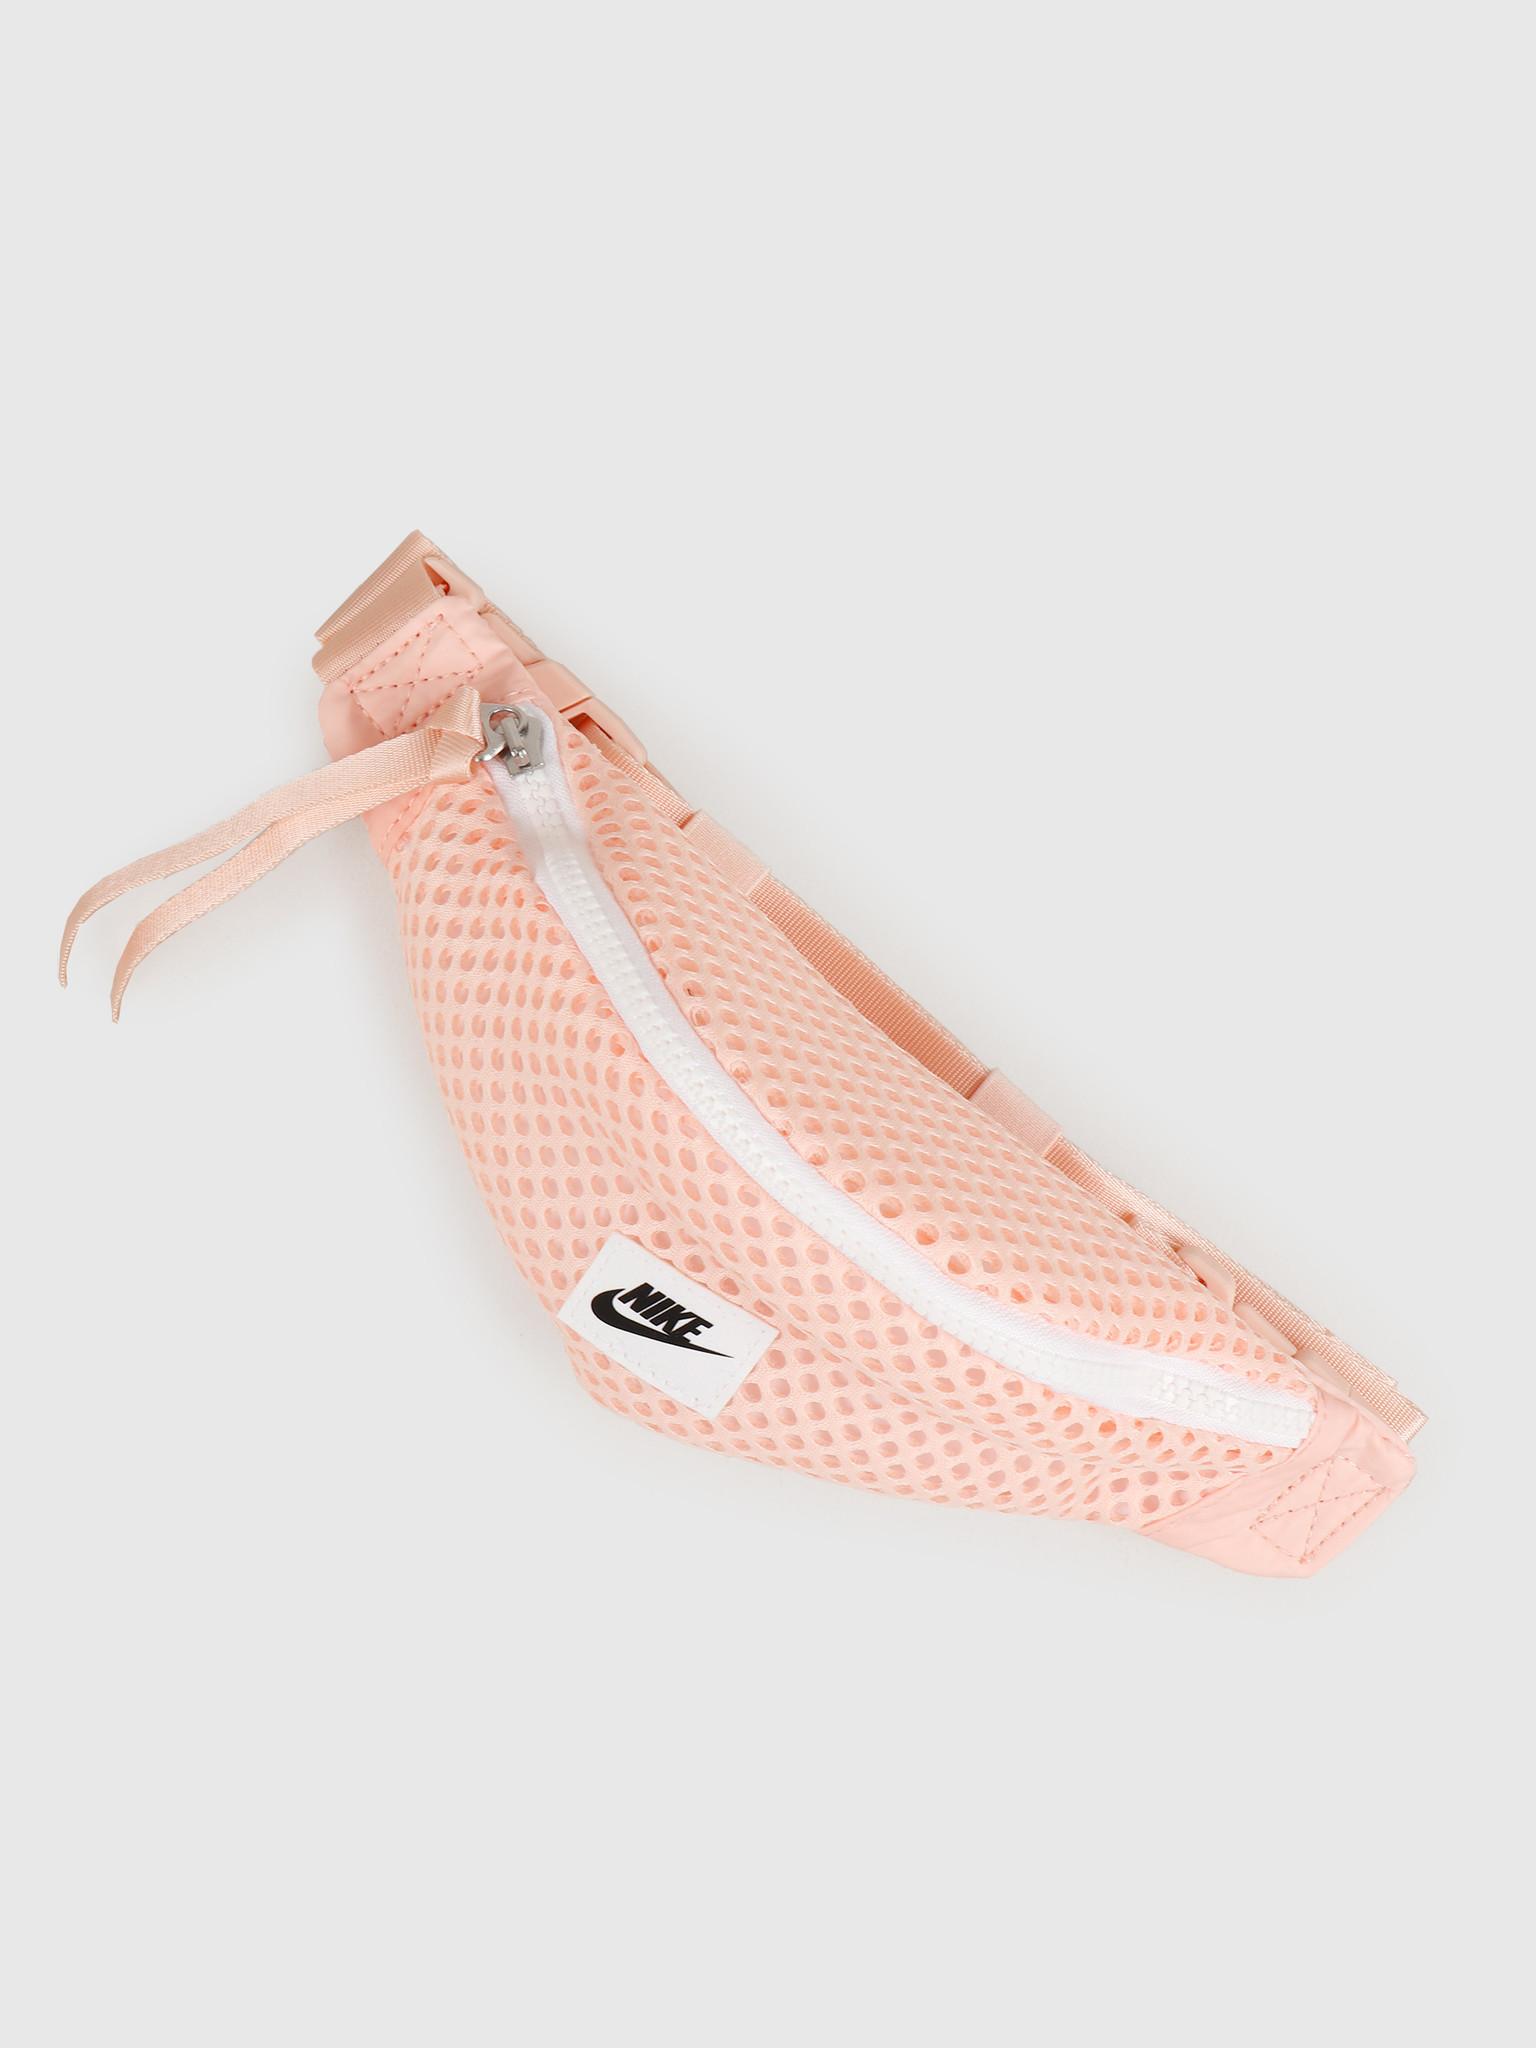 Nike Nike Air Waist Pack Sm Washed Coral Washed Coral Black CU2609-664